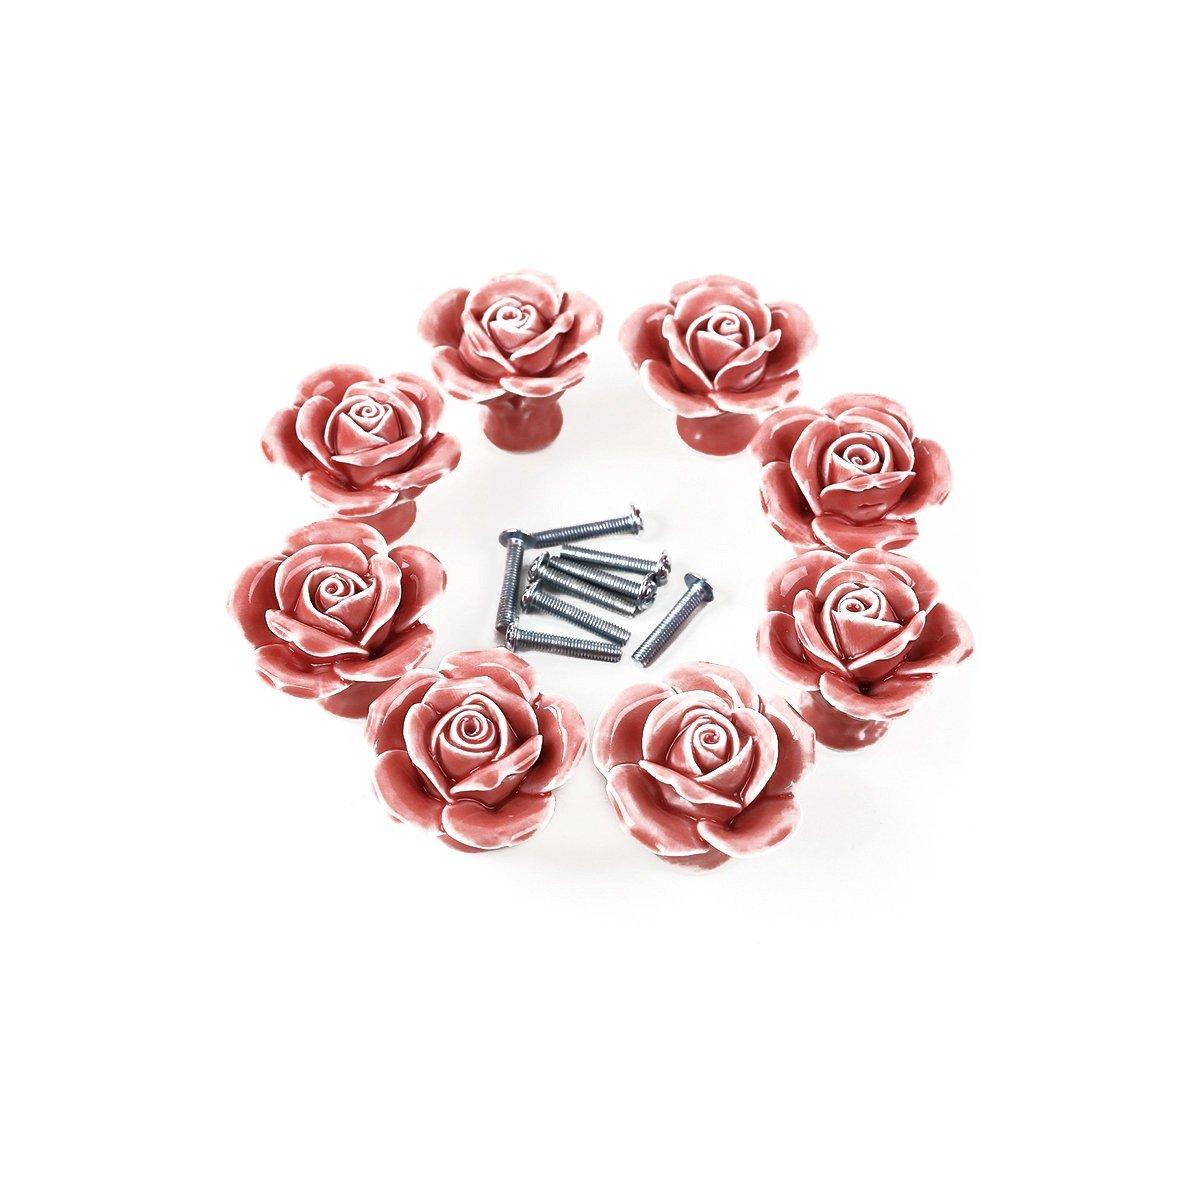 Tinksky 8pcs Rose Shaped Ceramic Kitchen Cupboard Cabinet Drawer Door Knobs Pull Handles (Pink)